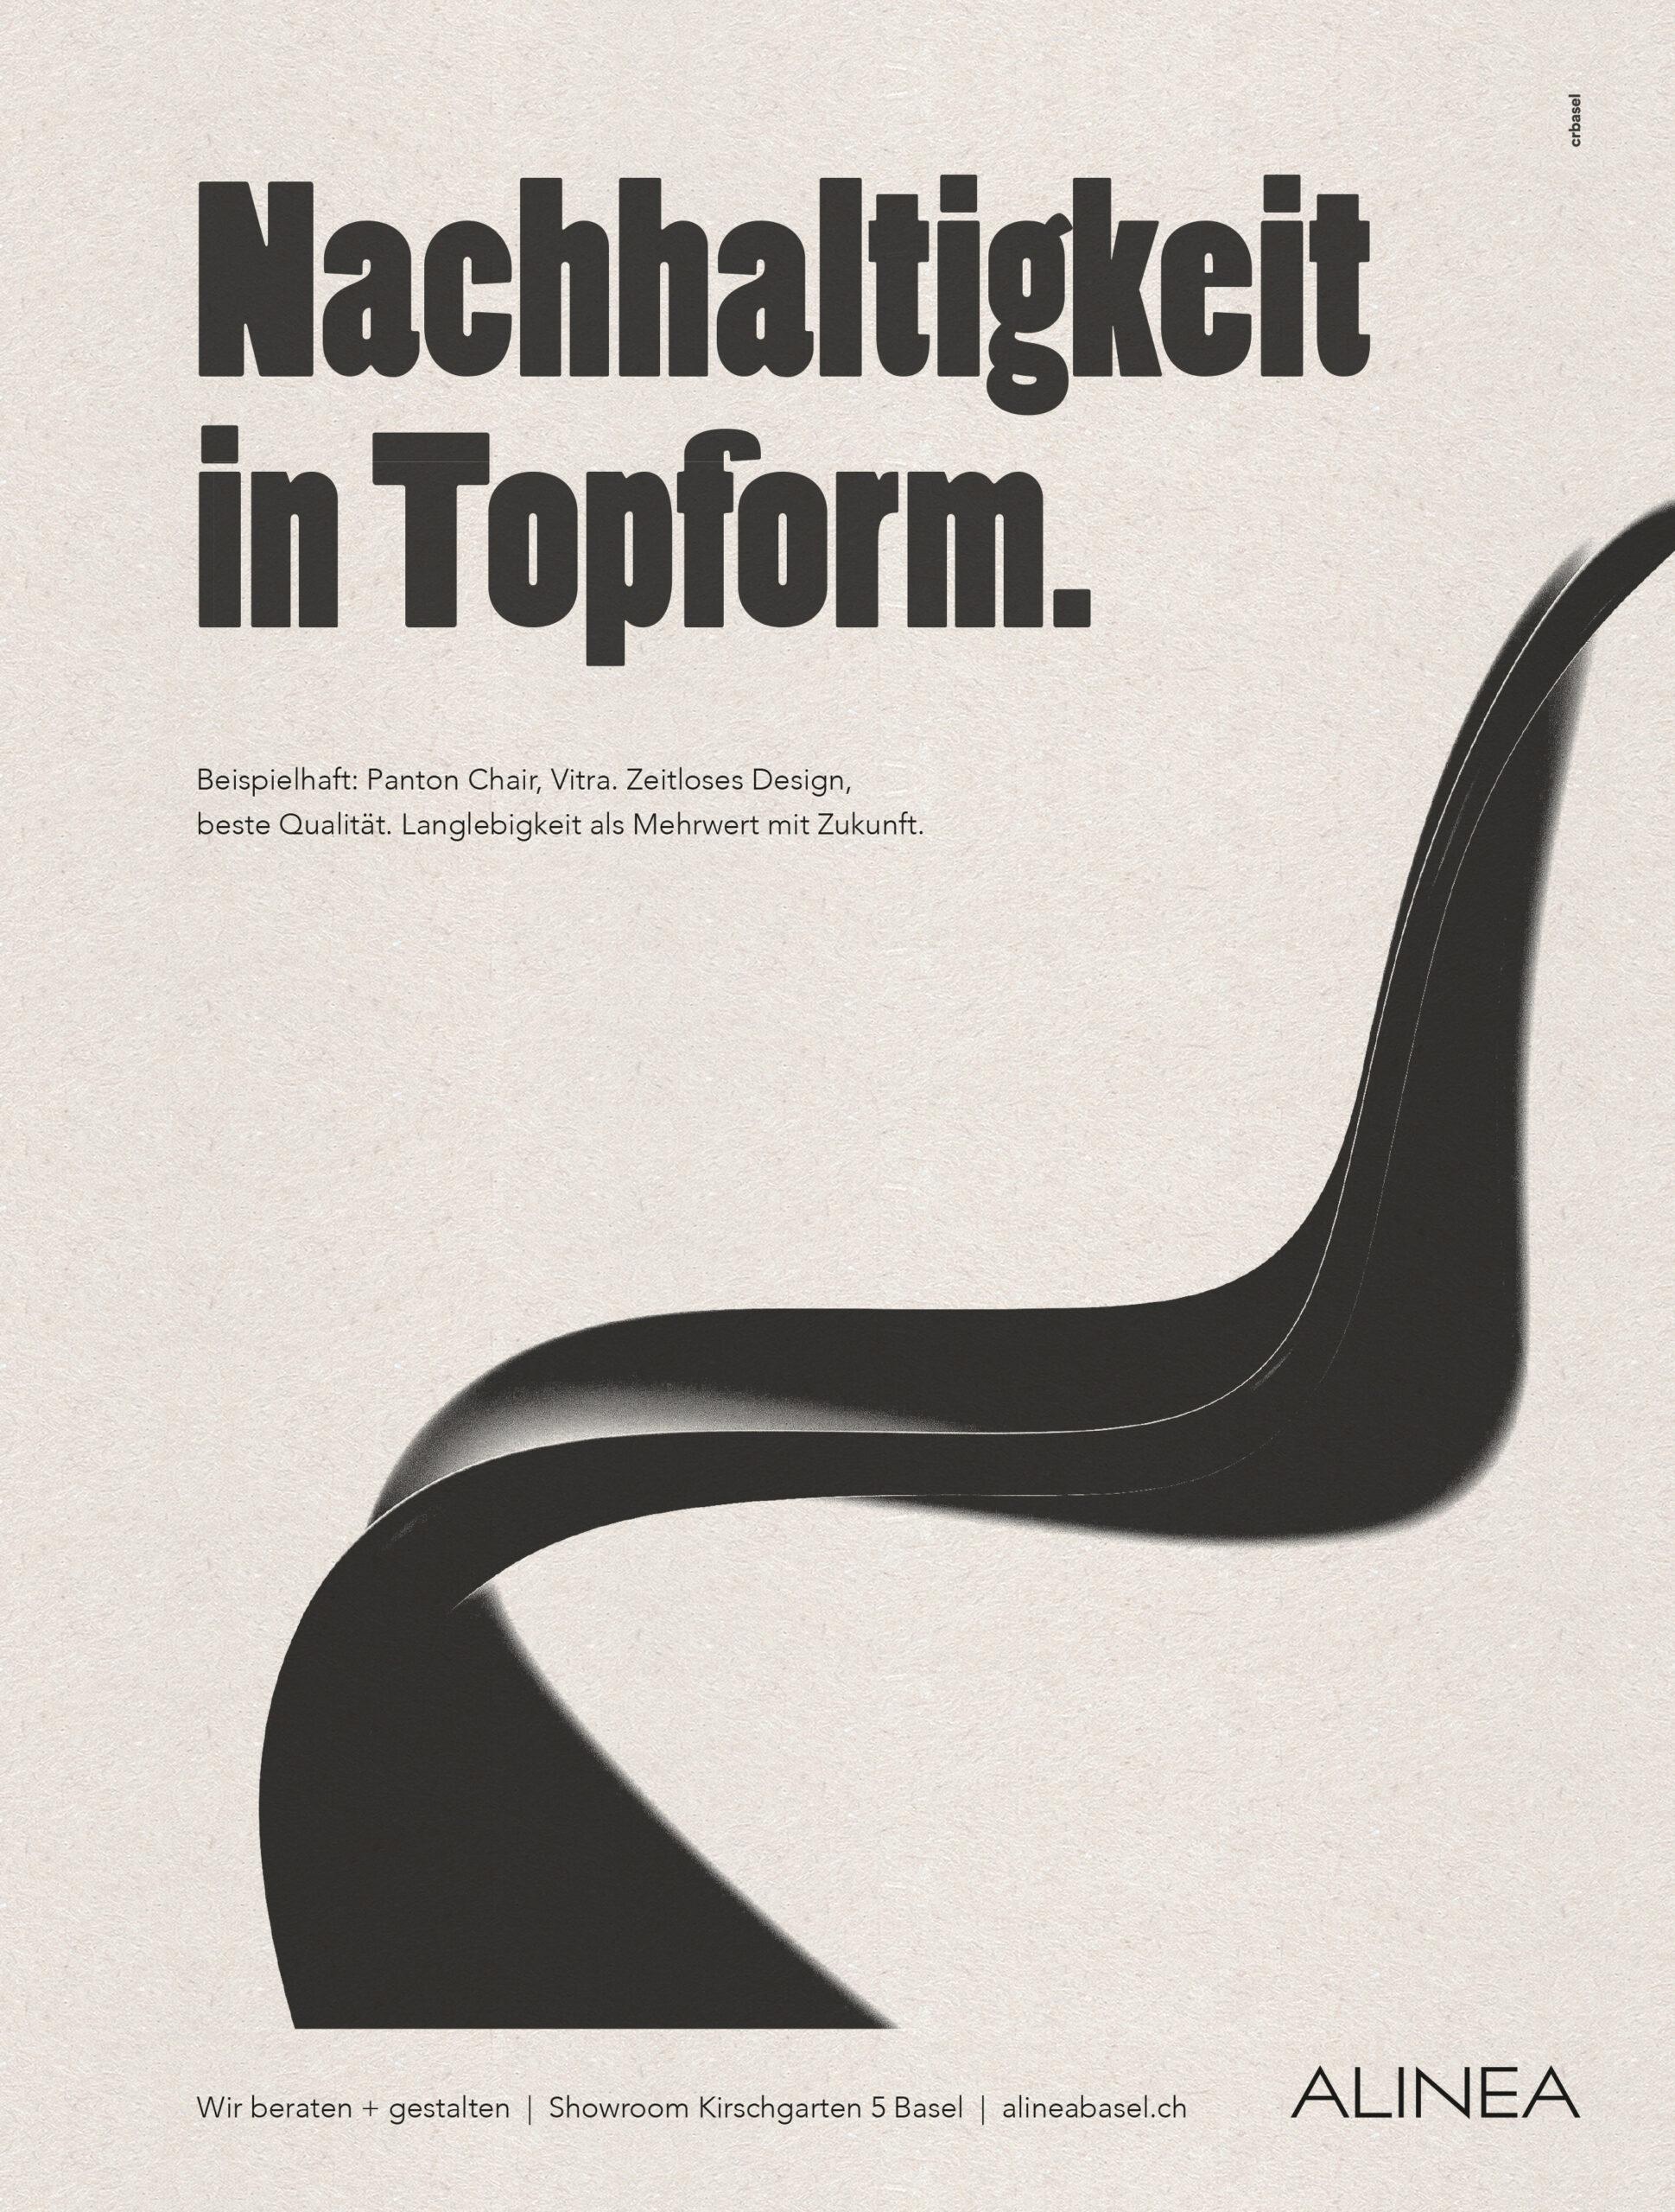 cr Werbeagentur AG Basel alinea